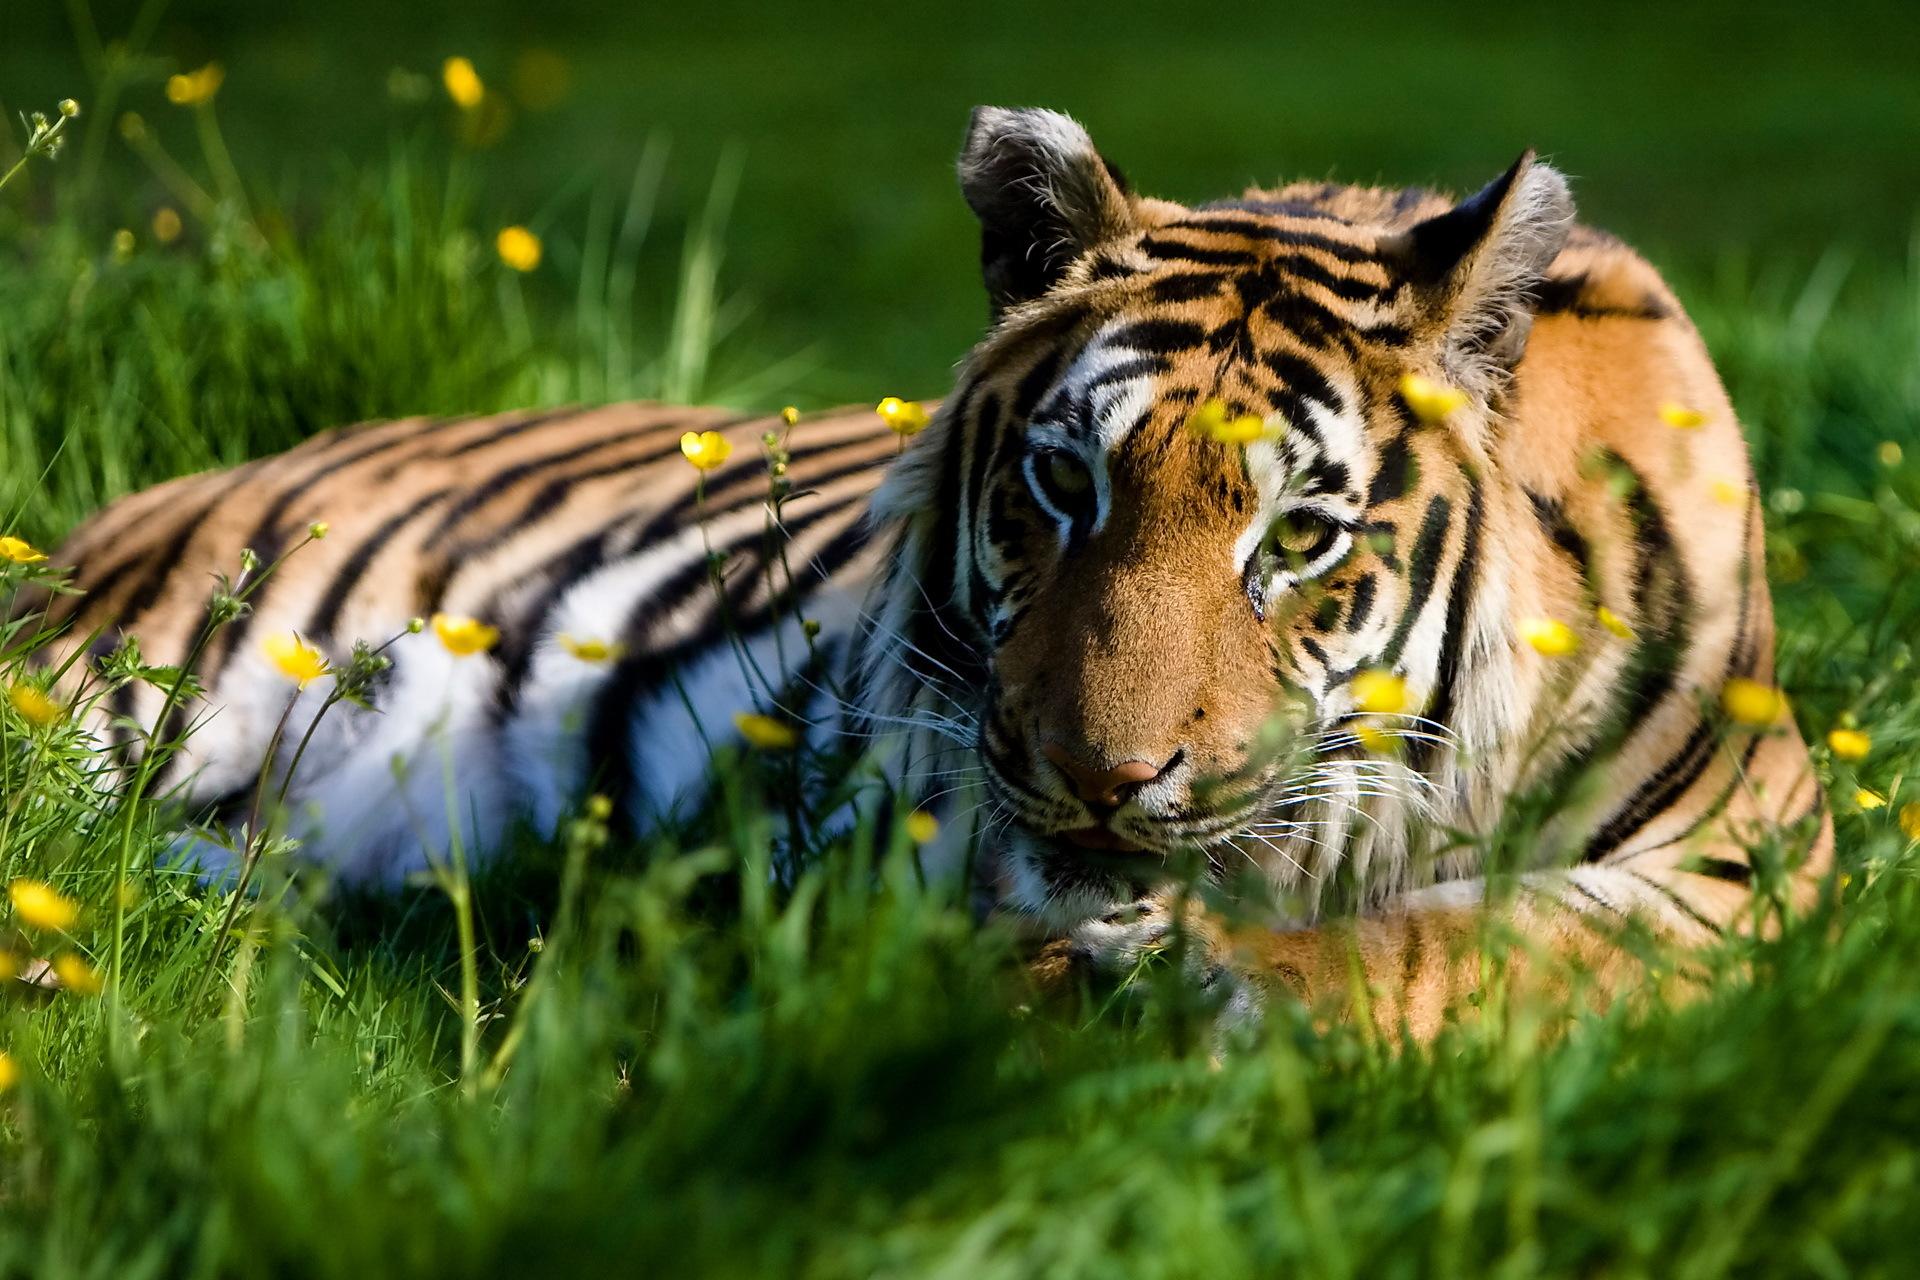 тигры трава природа  № 2011180 бесплатно